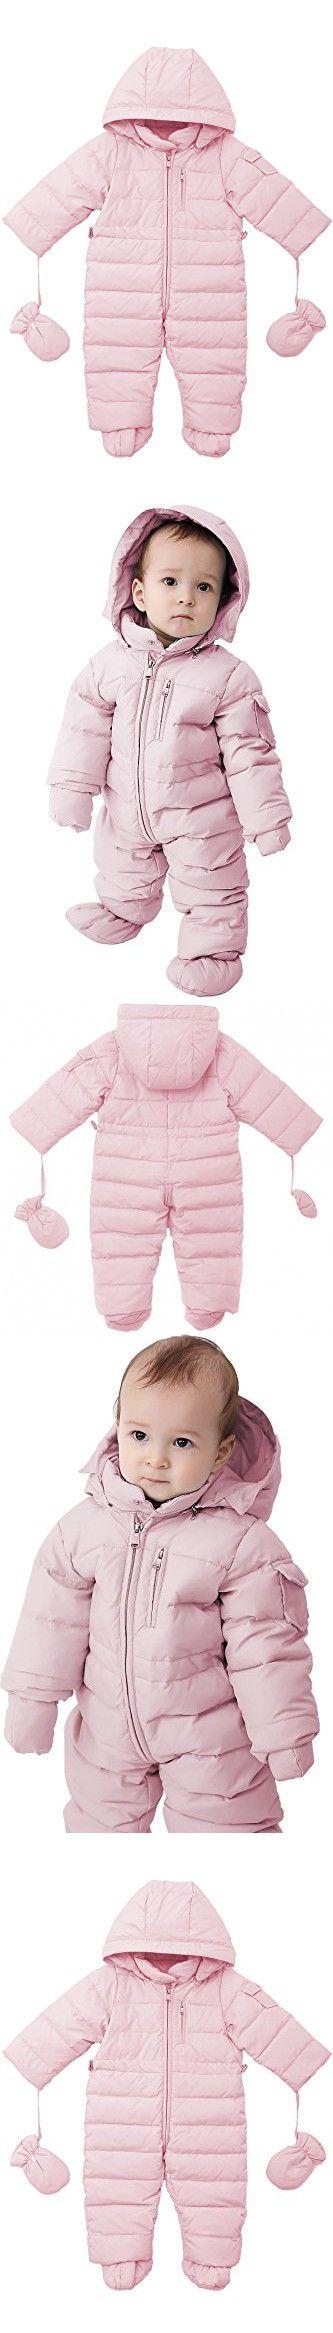 Oceankids Baby Boys Girls Pink Pram One-Piece Snowsuit Attached Hood 24M 18-24 Months